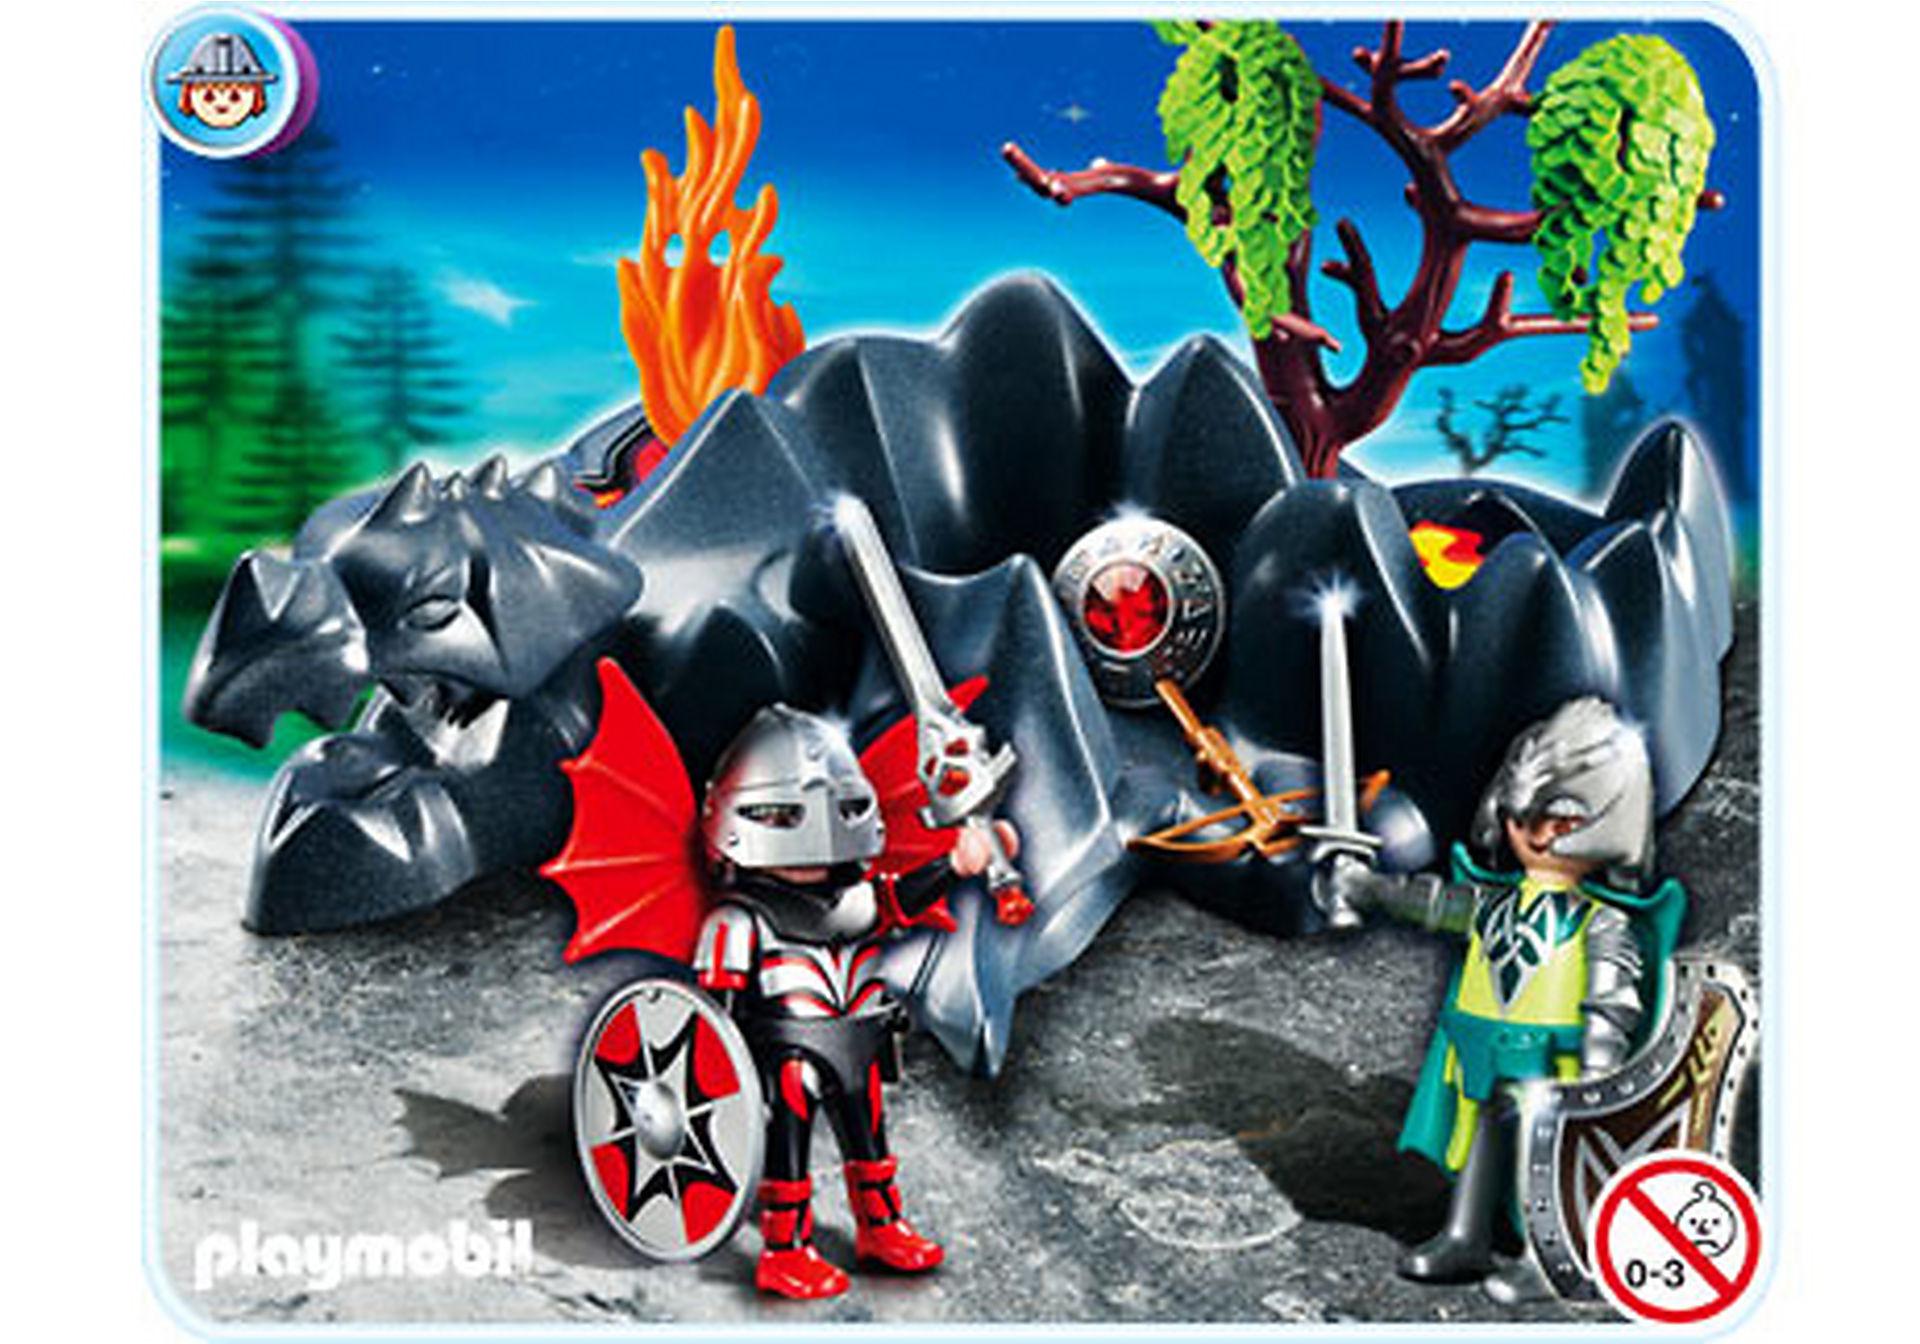 http://media.playmobil.com/i/playmobil/4147-A_product_detail/KompaktSet Drachenfels